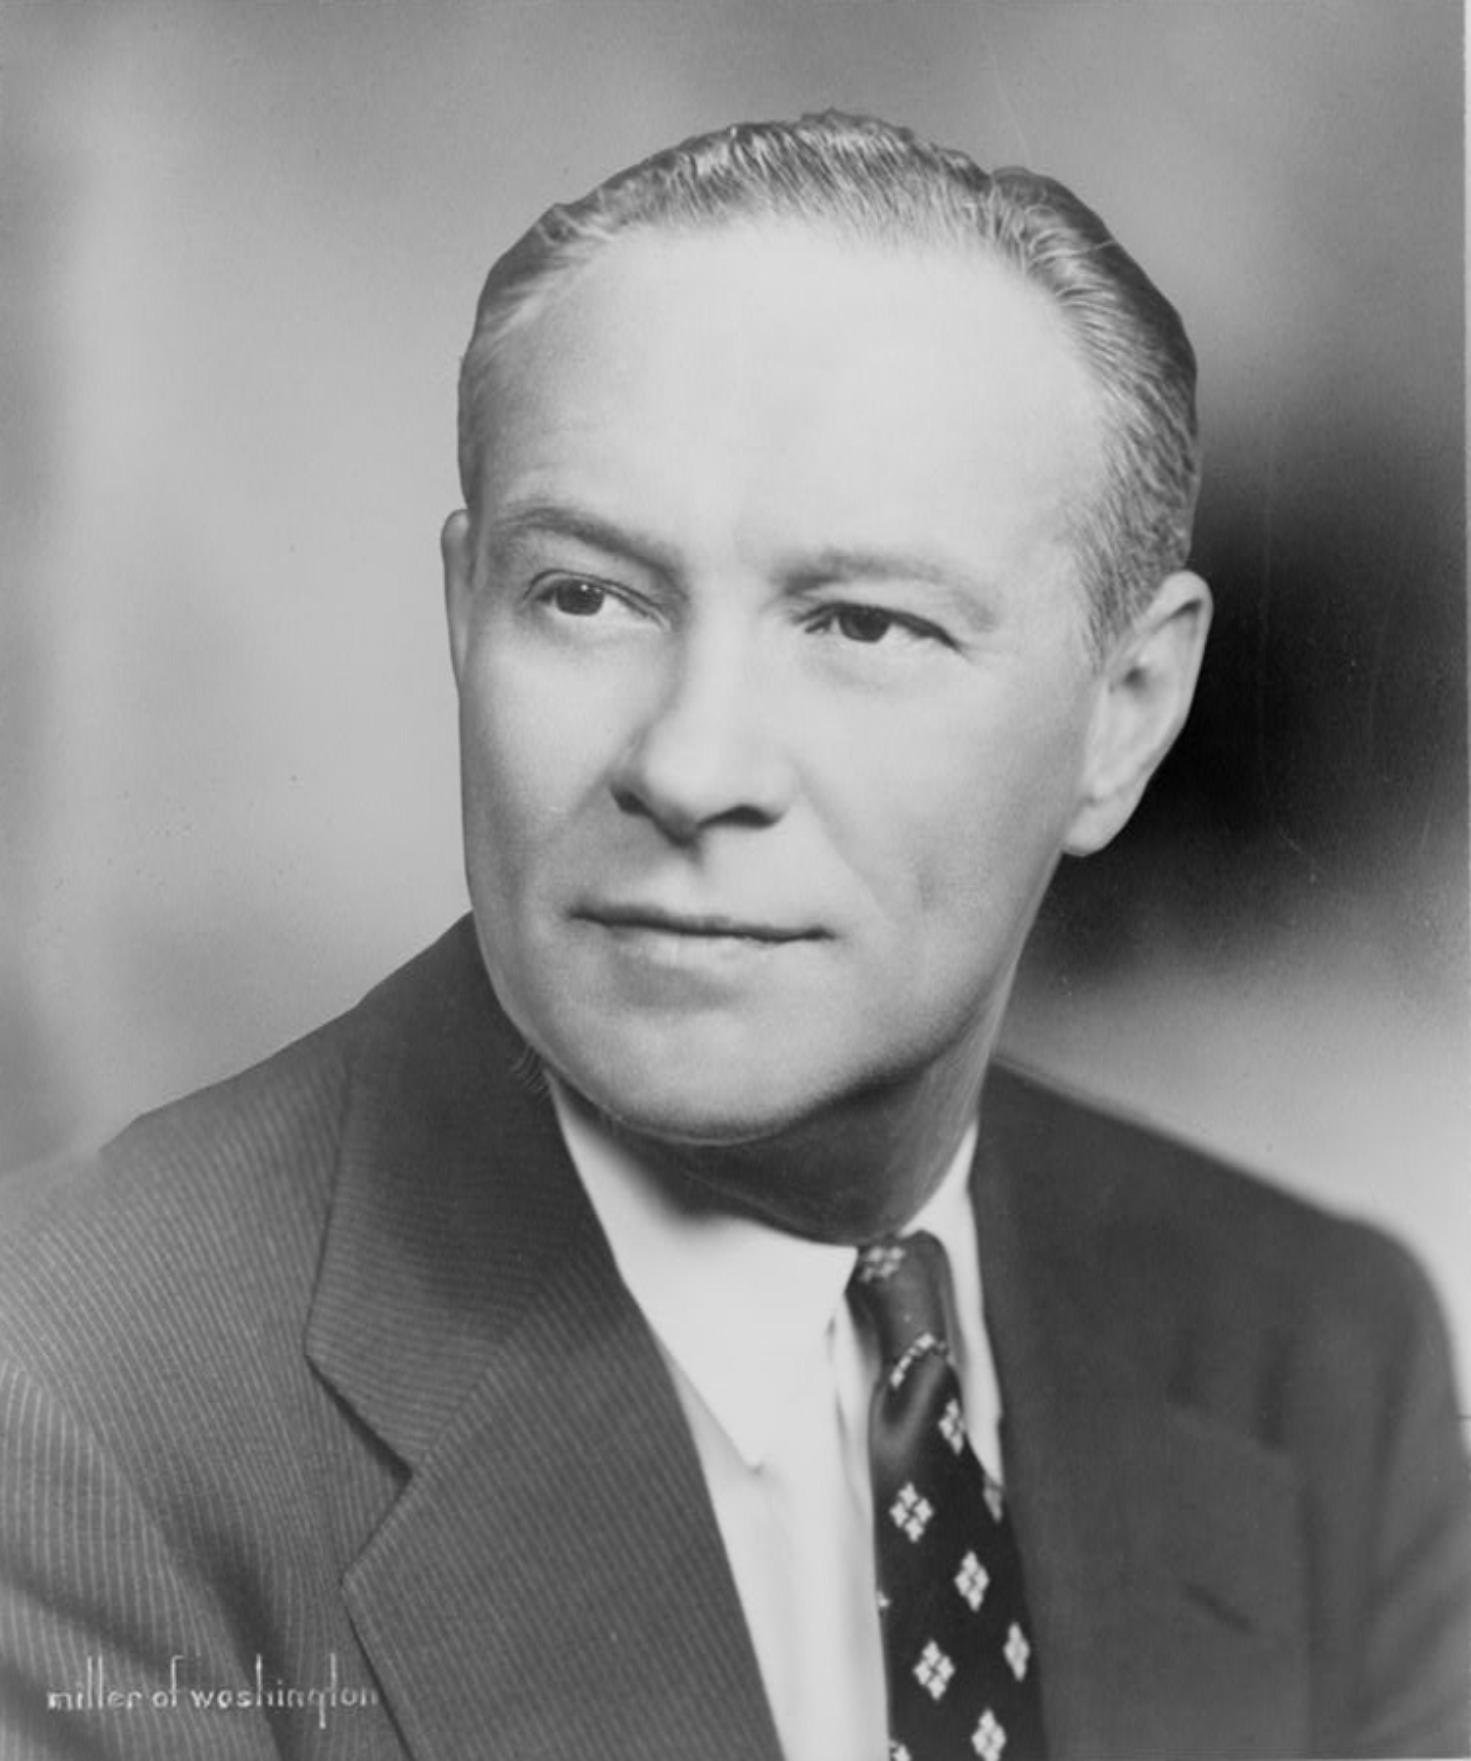 William E. Jenner